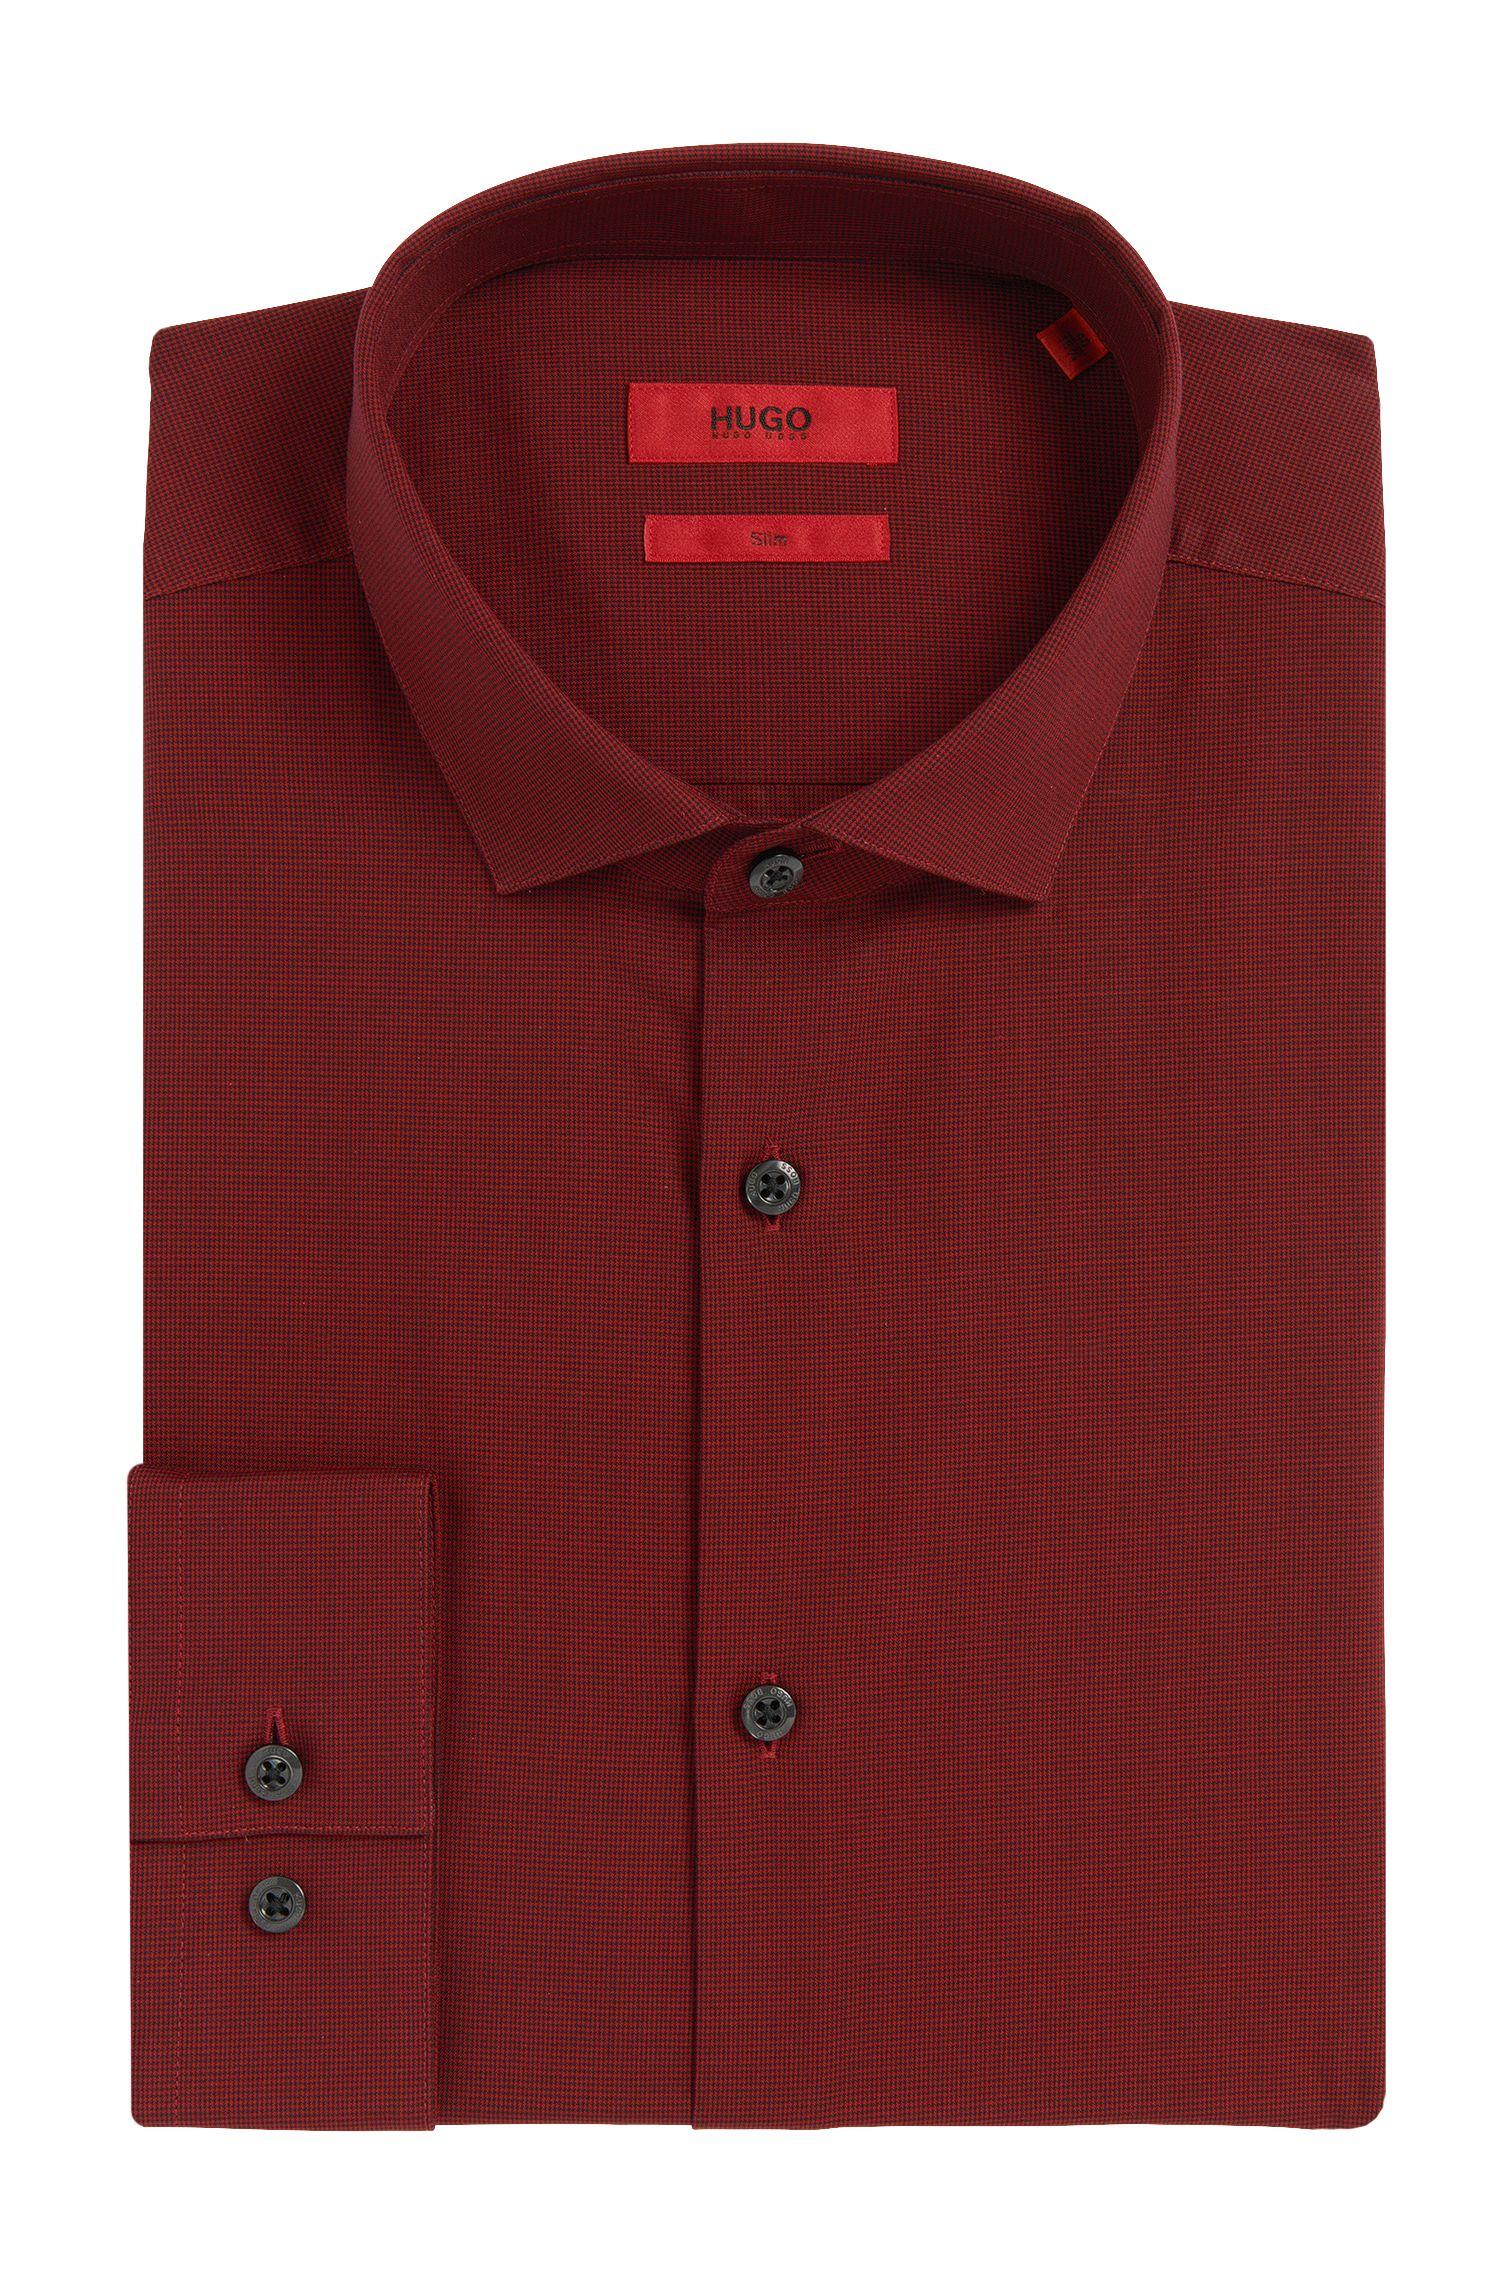 'Erondo' | Slim Fit, Cotton Dress Shirt